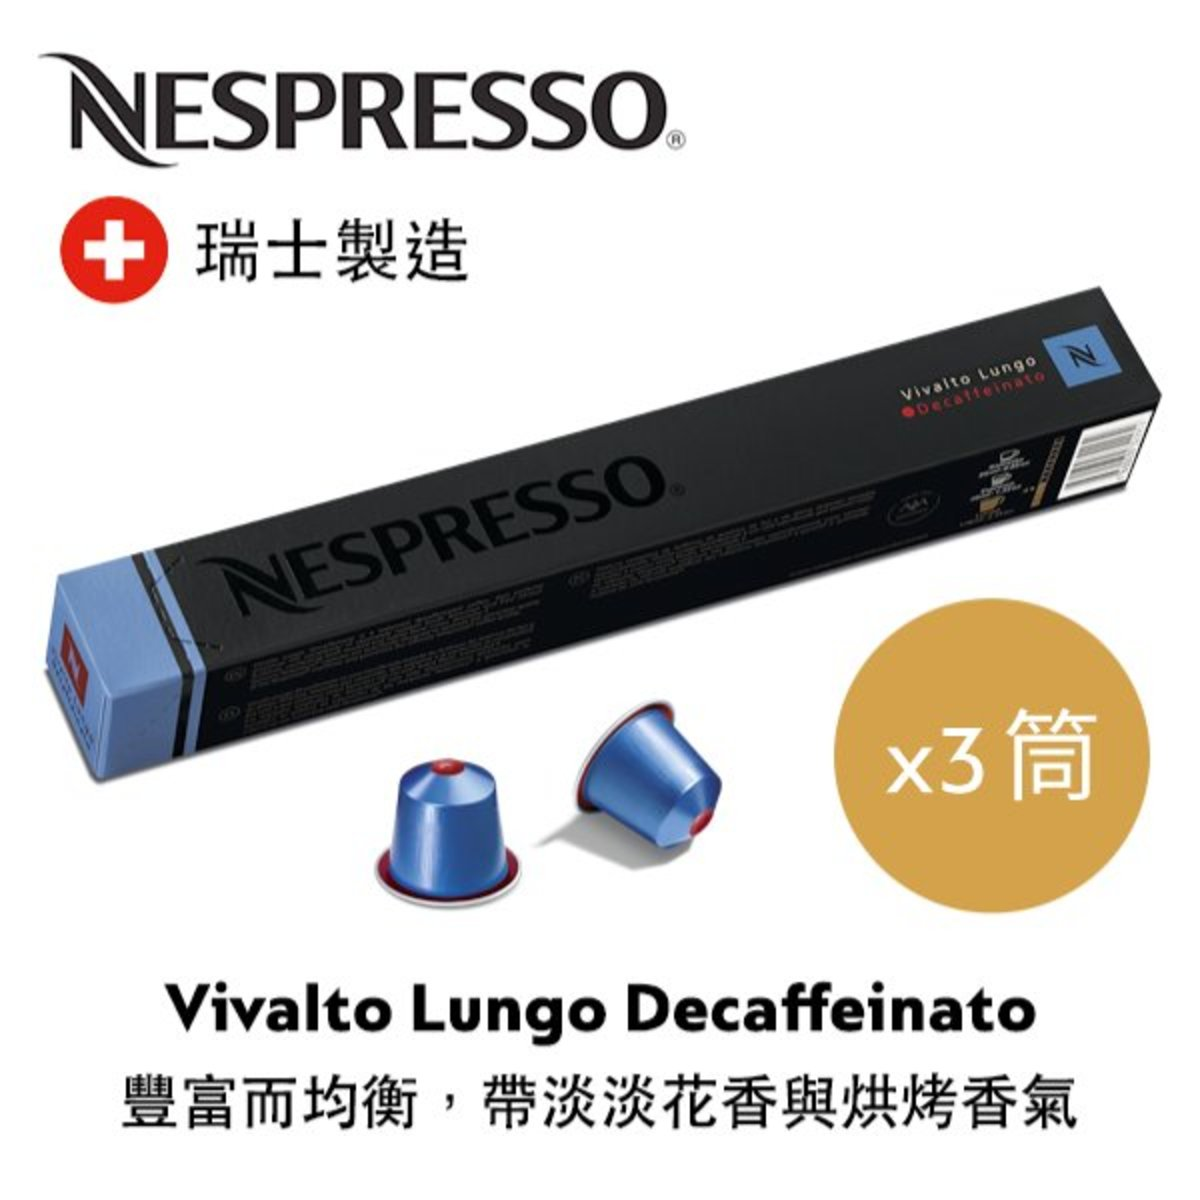 Vivalto Lungo Decaffeinato 咖啡粉囊x 3 筒- 低咖啡因咖啡系列 (每筒包含 10 粒)